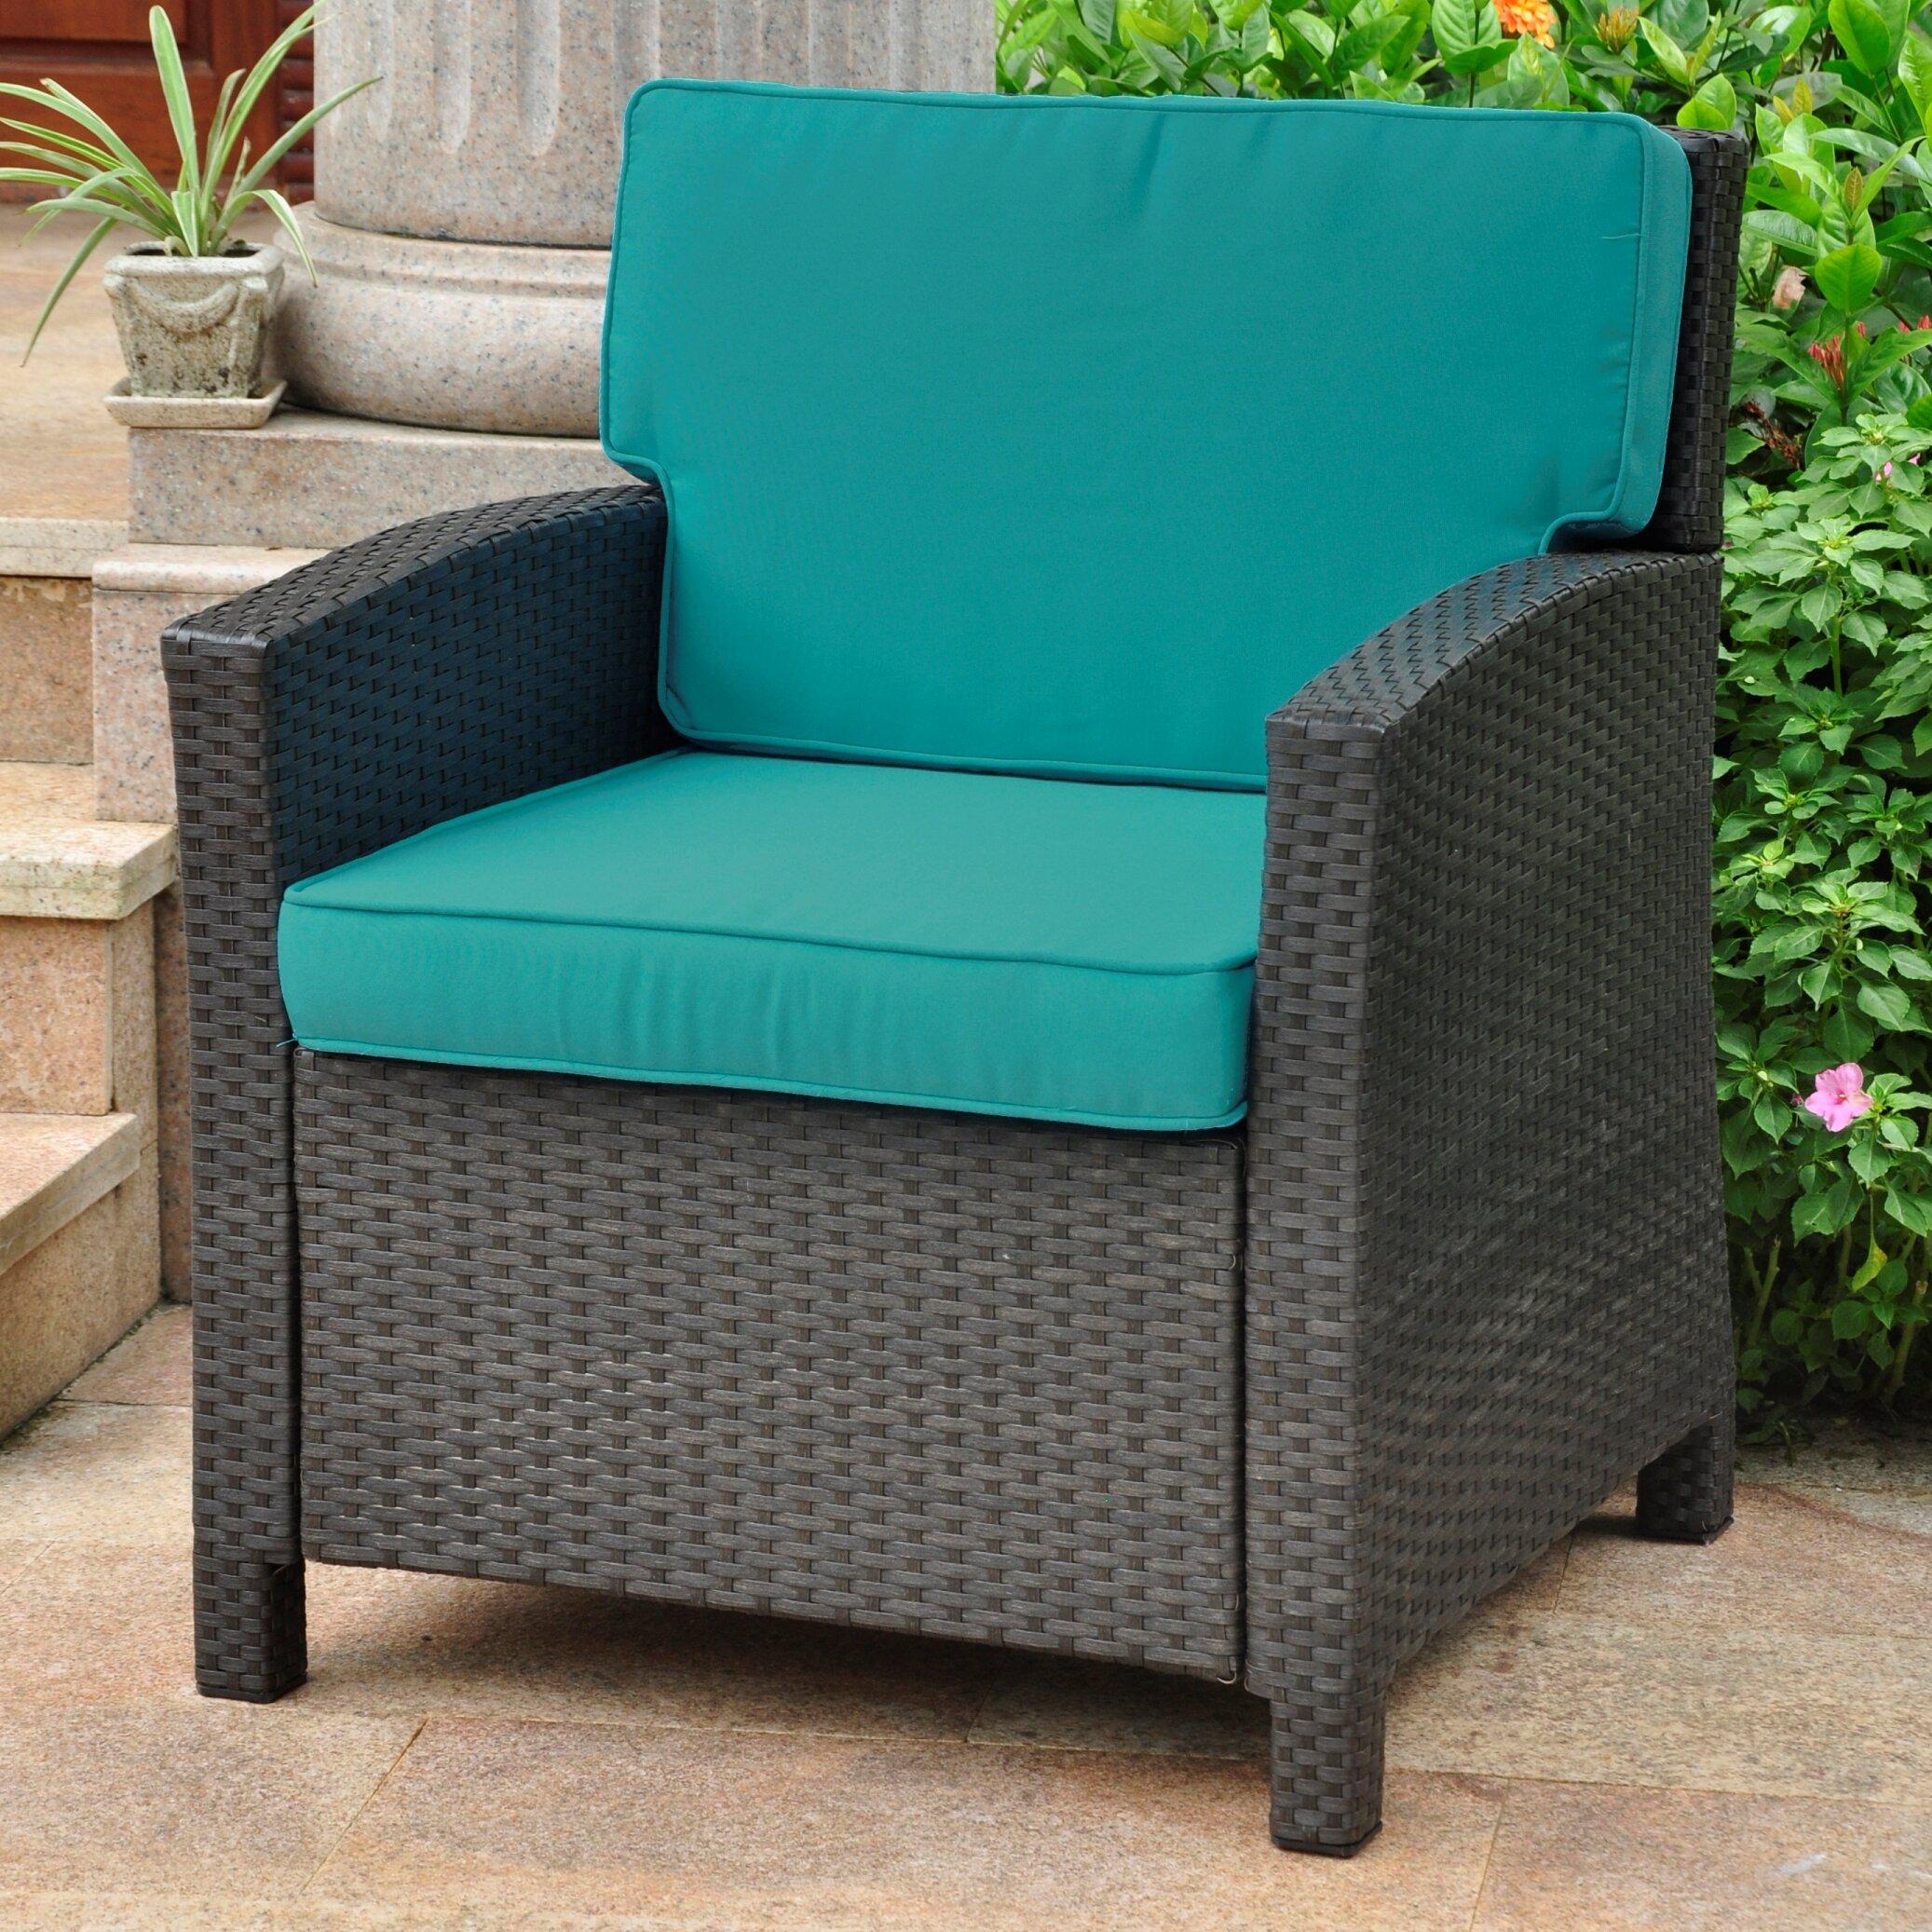 Make Wicker Chair Cushions International Caravan Valencia Wicker Resin Contemporary Patio Chair